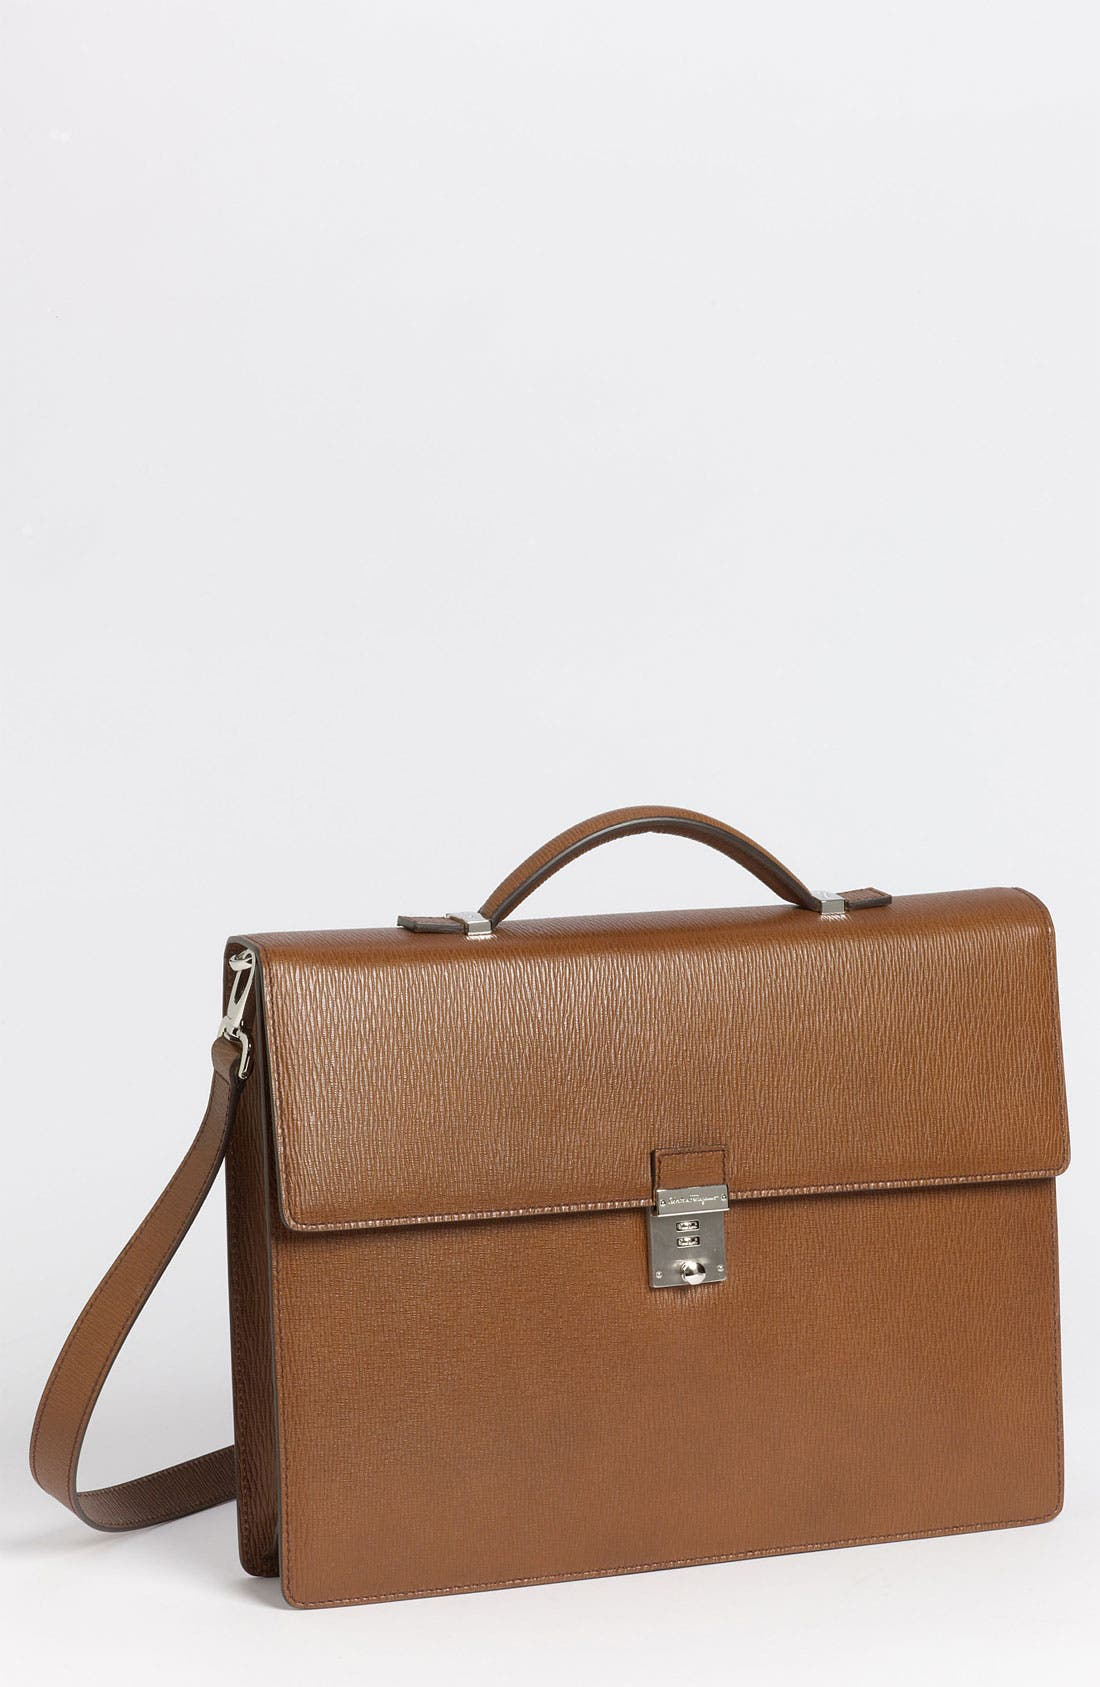 Alternate Image 1 Selected - Salvatore Ferragamo 'Revival' Briefcase